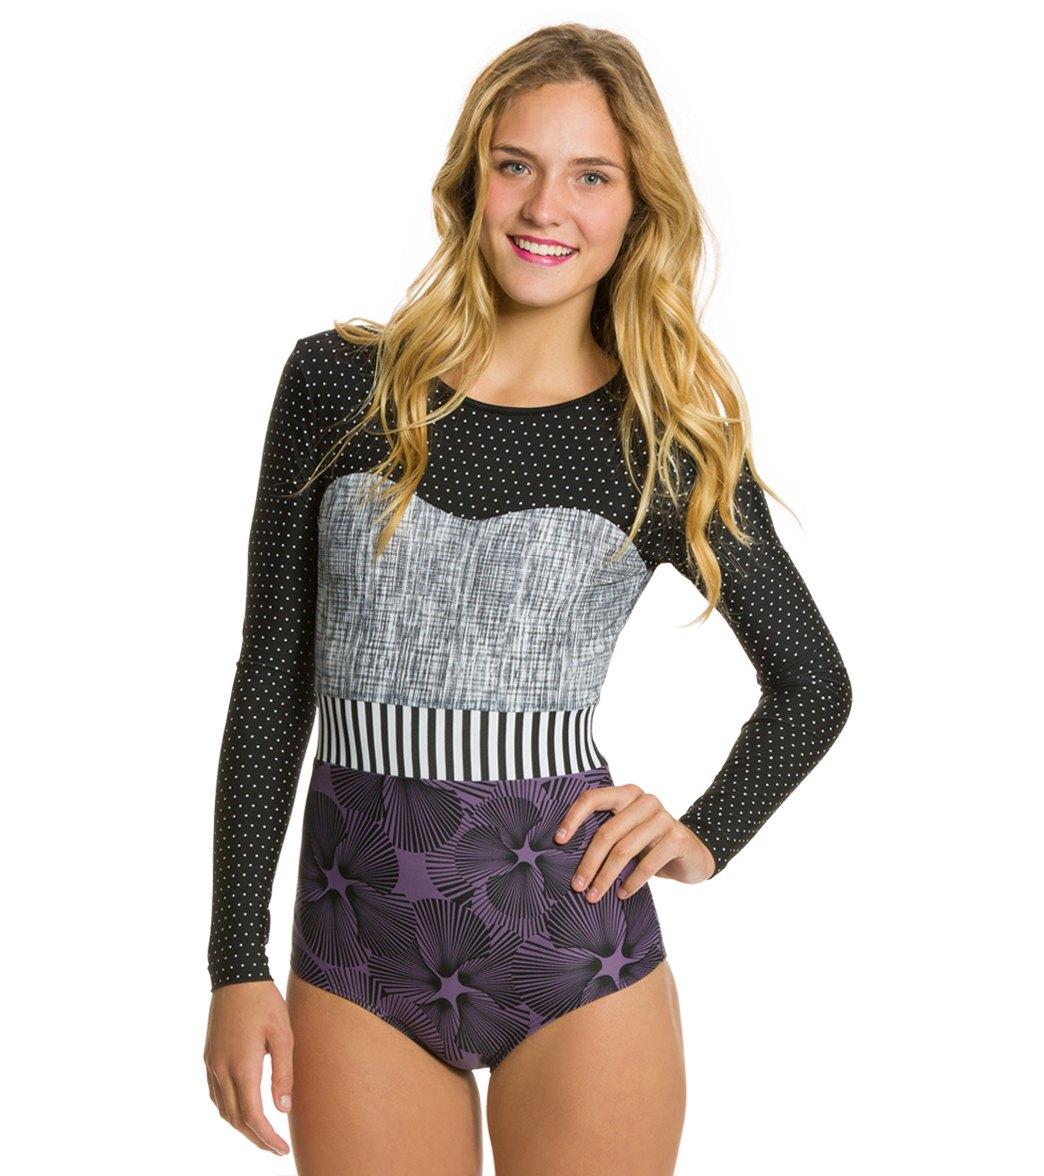 Seea Hermosa Black Dot Surf Suit at SwimOutlet.com - Free Shipping b5e94f8d6